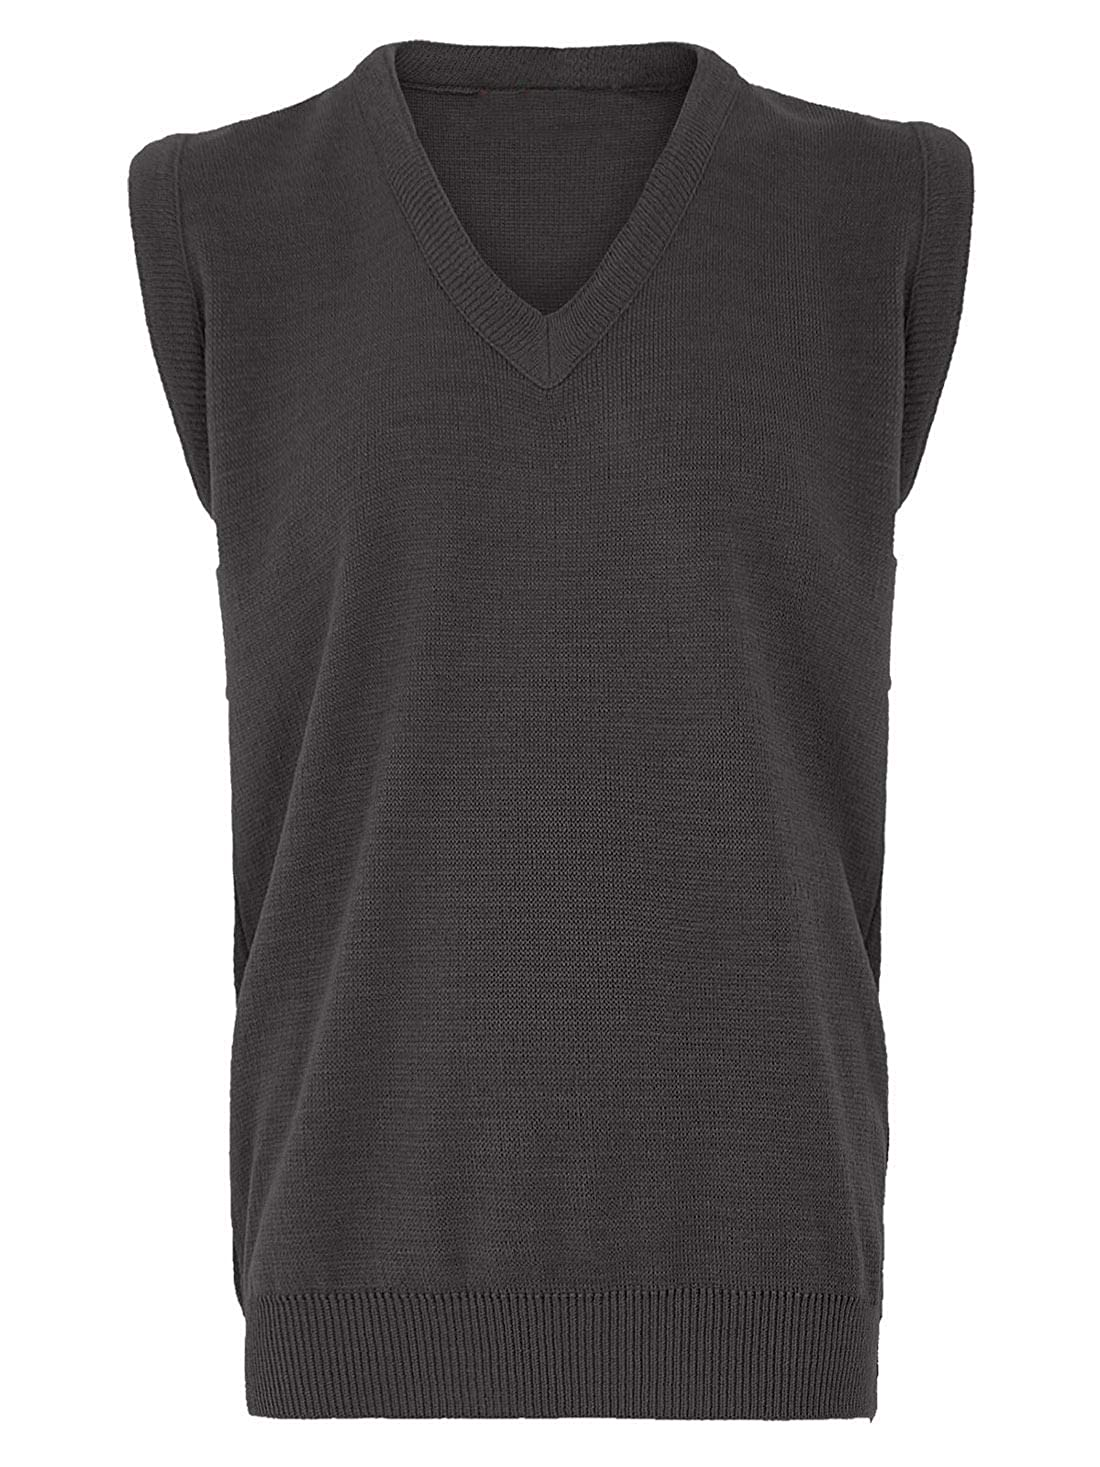 DIGITAL SPOT Mens Plain Knitted Slipover Tank Top Adult Sleeveless V Neck Sports Wear Sweater Small//5X-Large